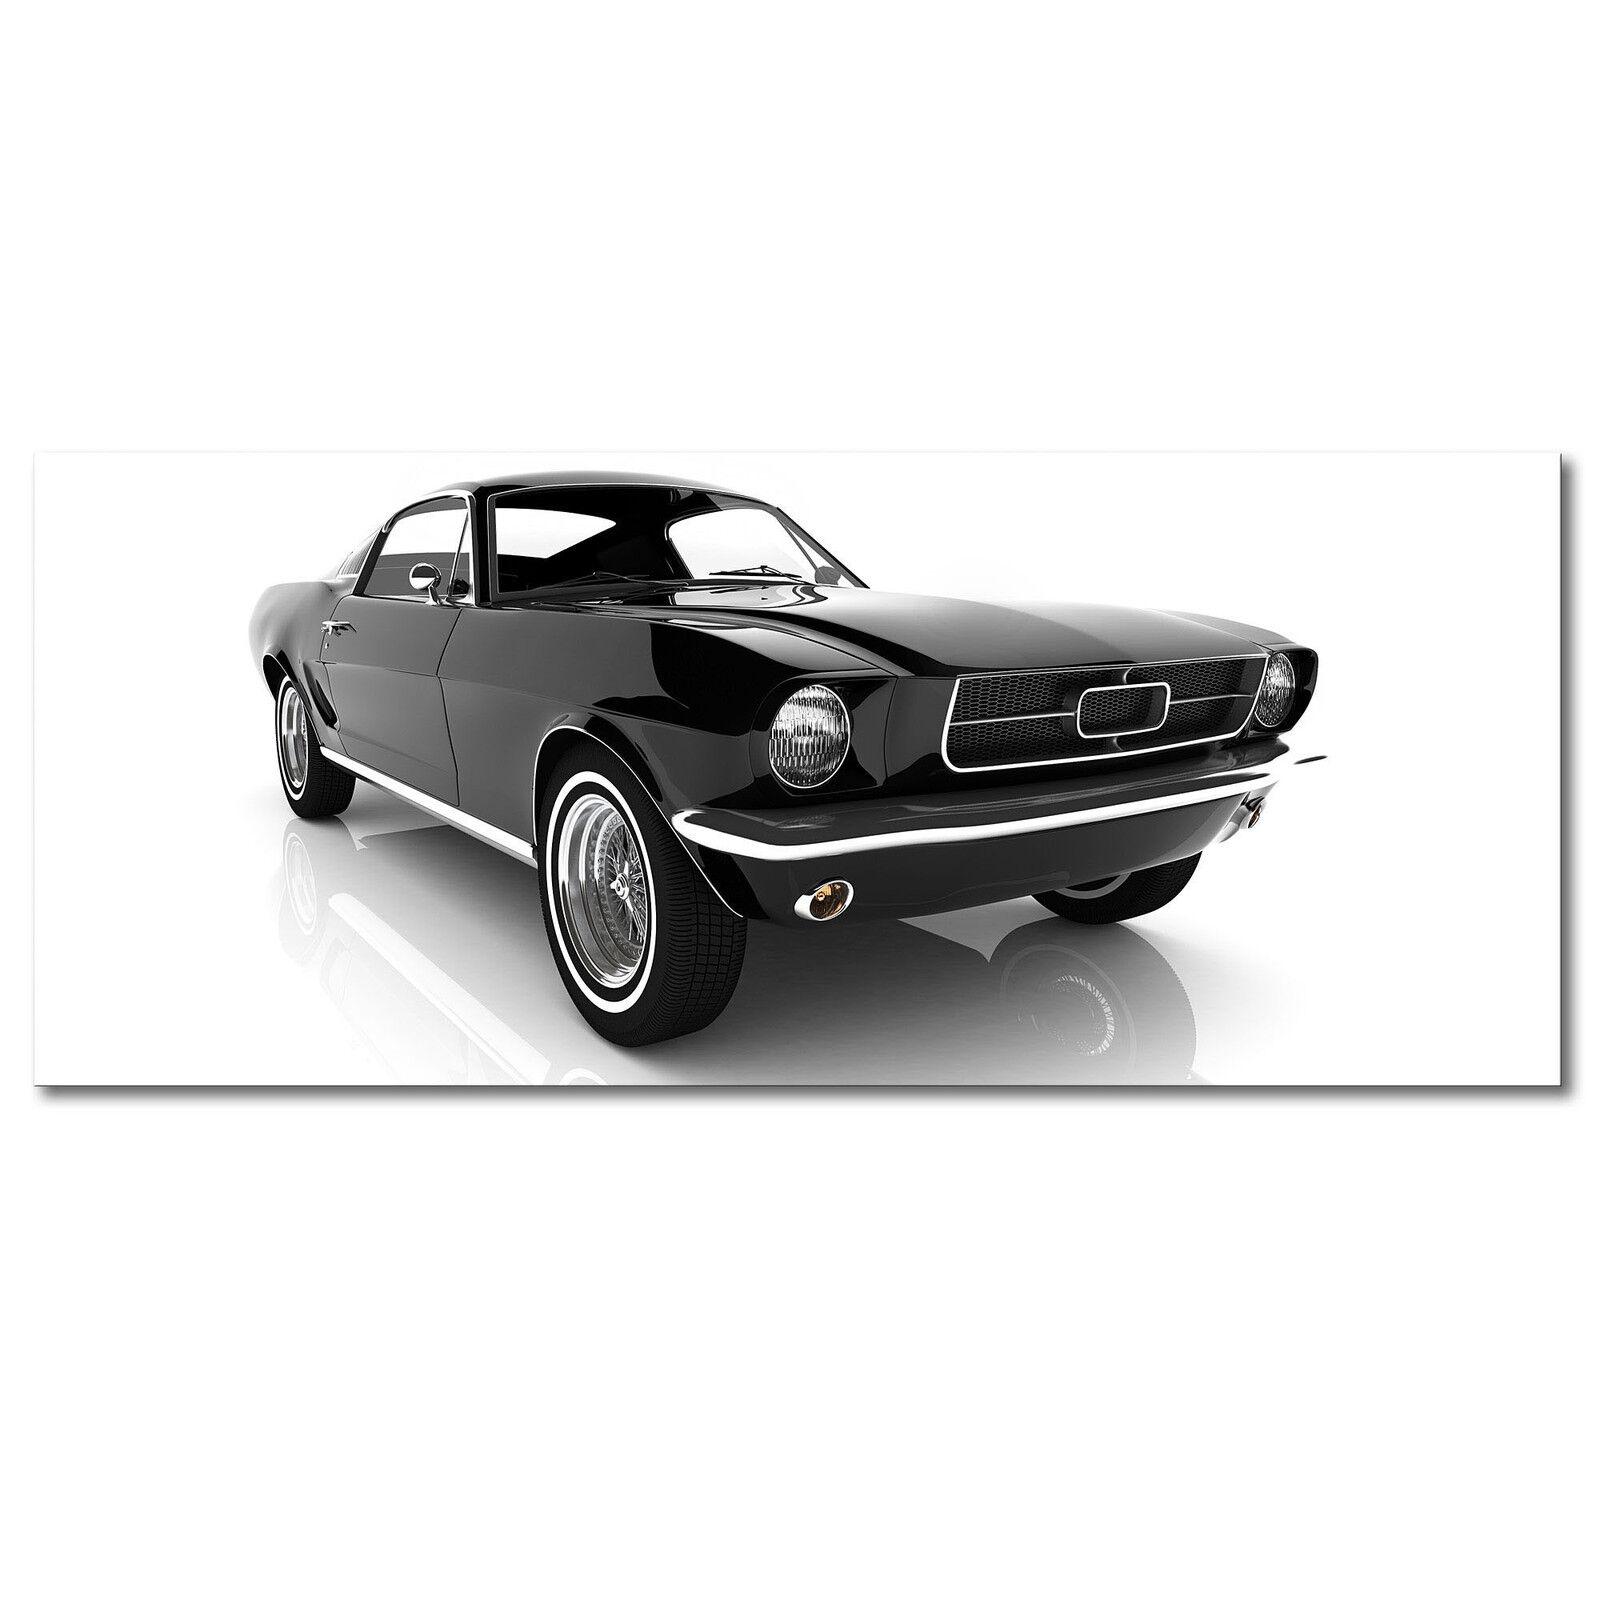 Qualitätsdruck auf Leinwand - Das Leinwandbild  Mustang